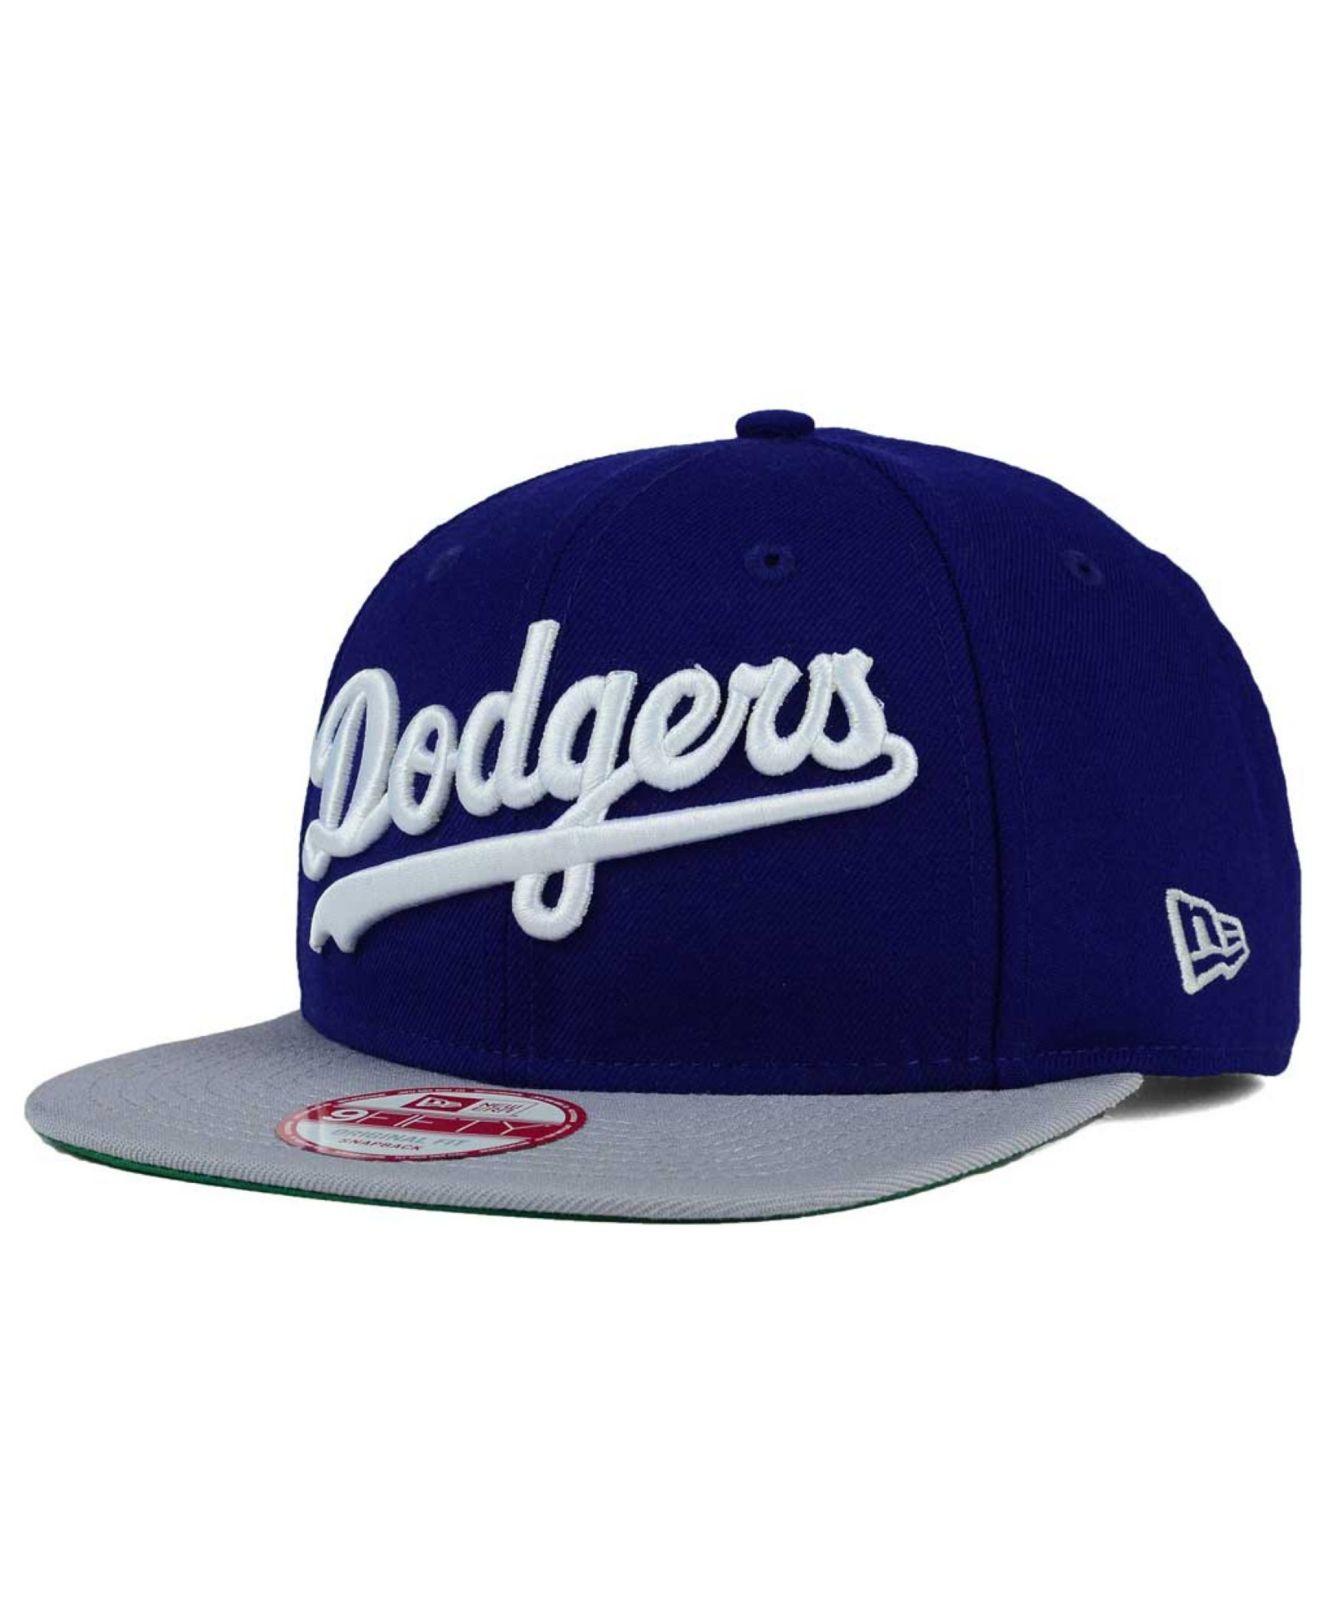 wholesale dealer 09eb9 ac309 KTZ Los Angeles Dodgers Xl Script 9fifty Snapback Cap in Blue for ...